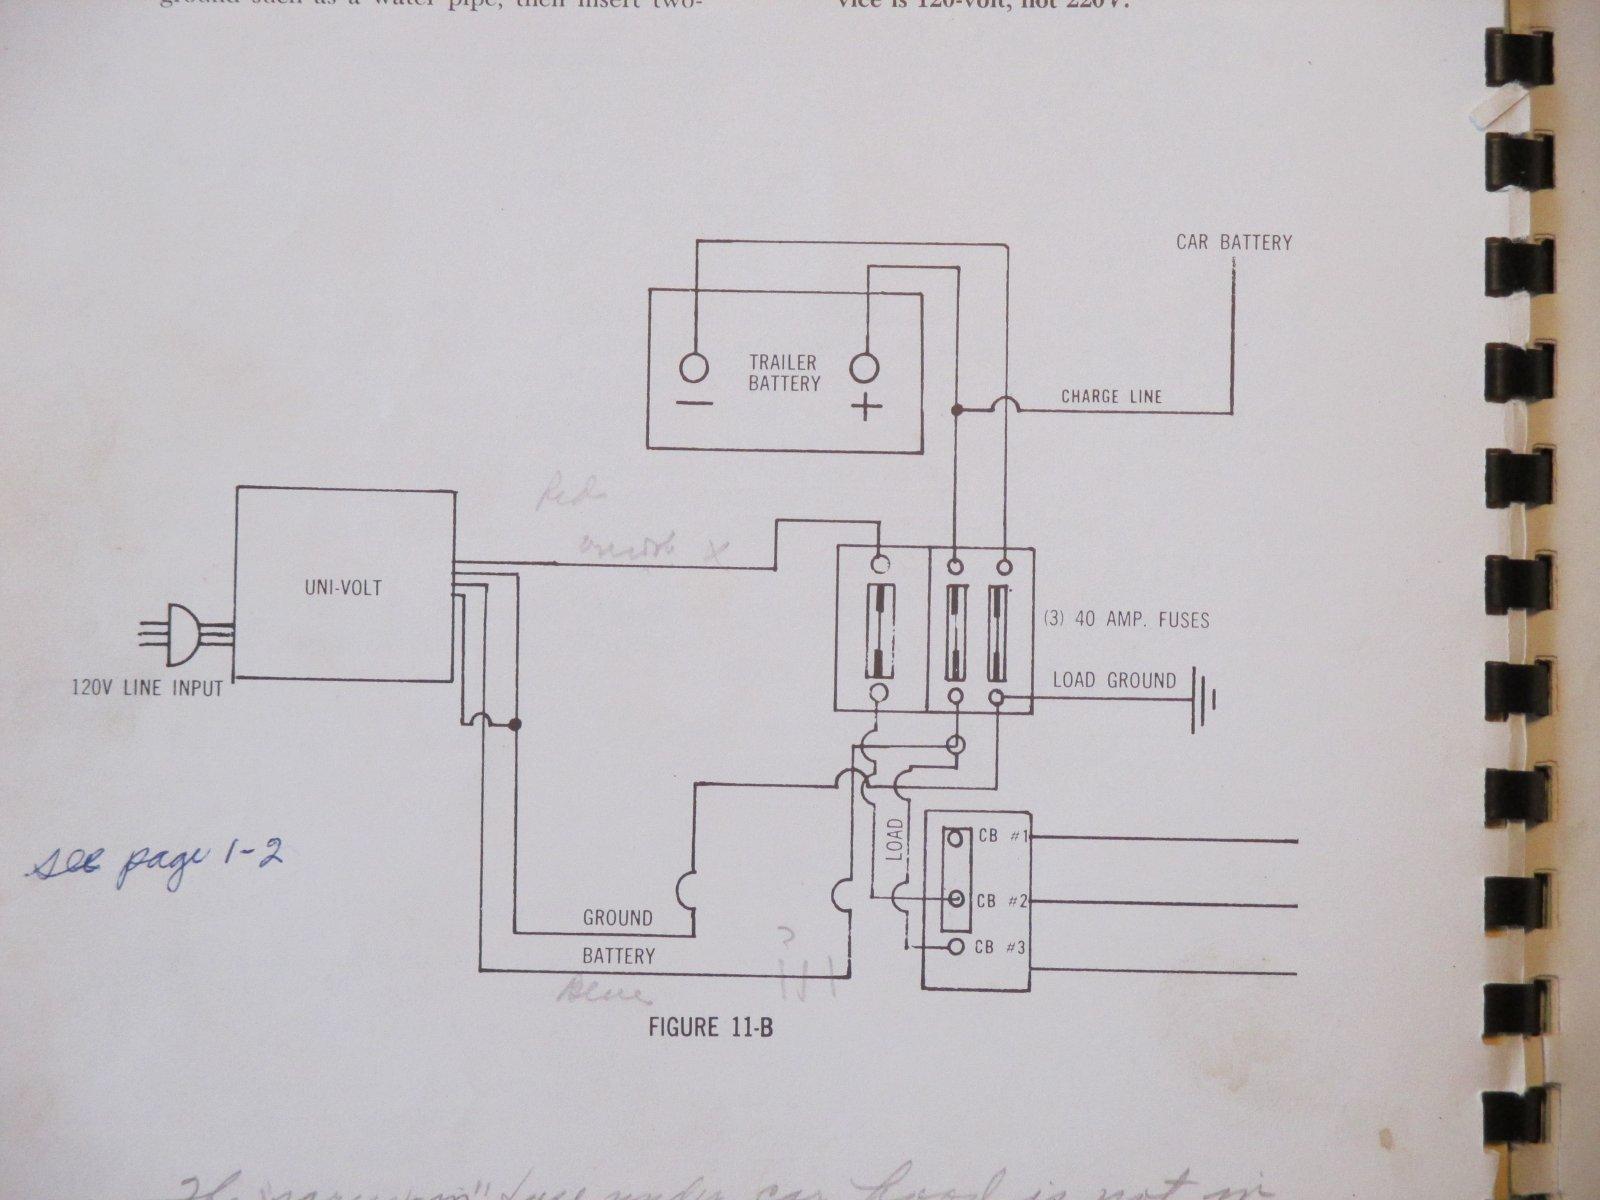 Click image for larger version  Name:1404 Univolt Wiring Diagram.jpg Views:15 Size:180.7 KB ID:273035